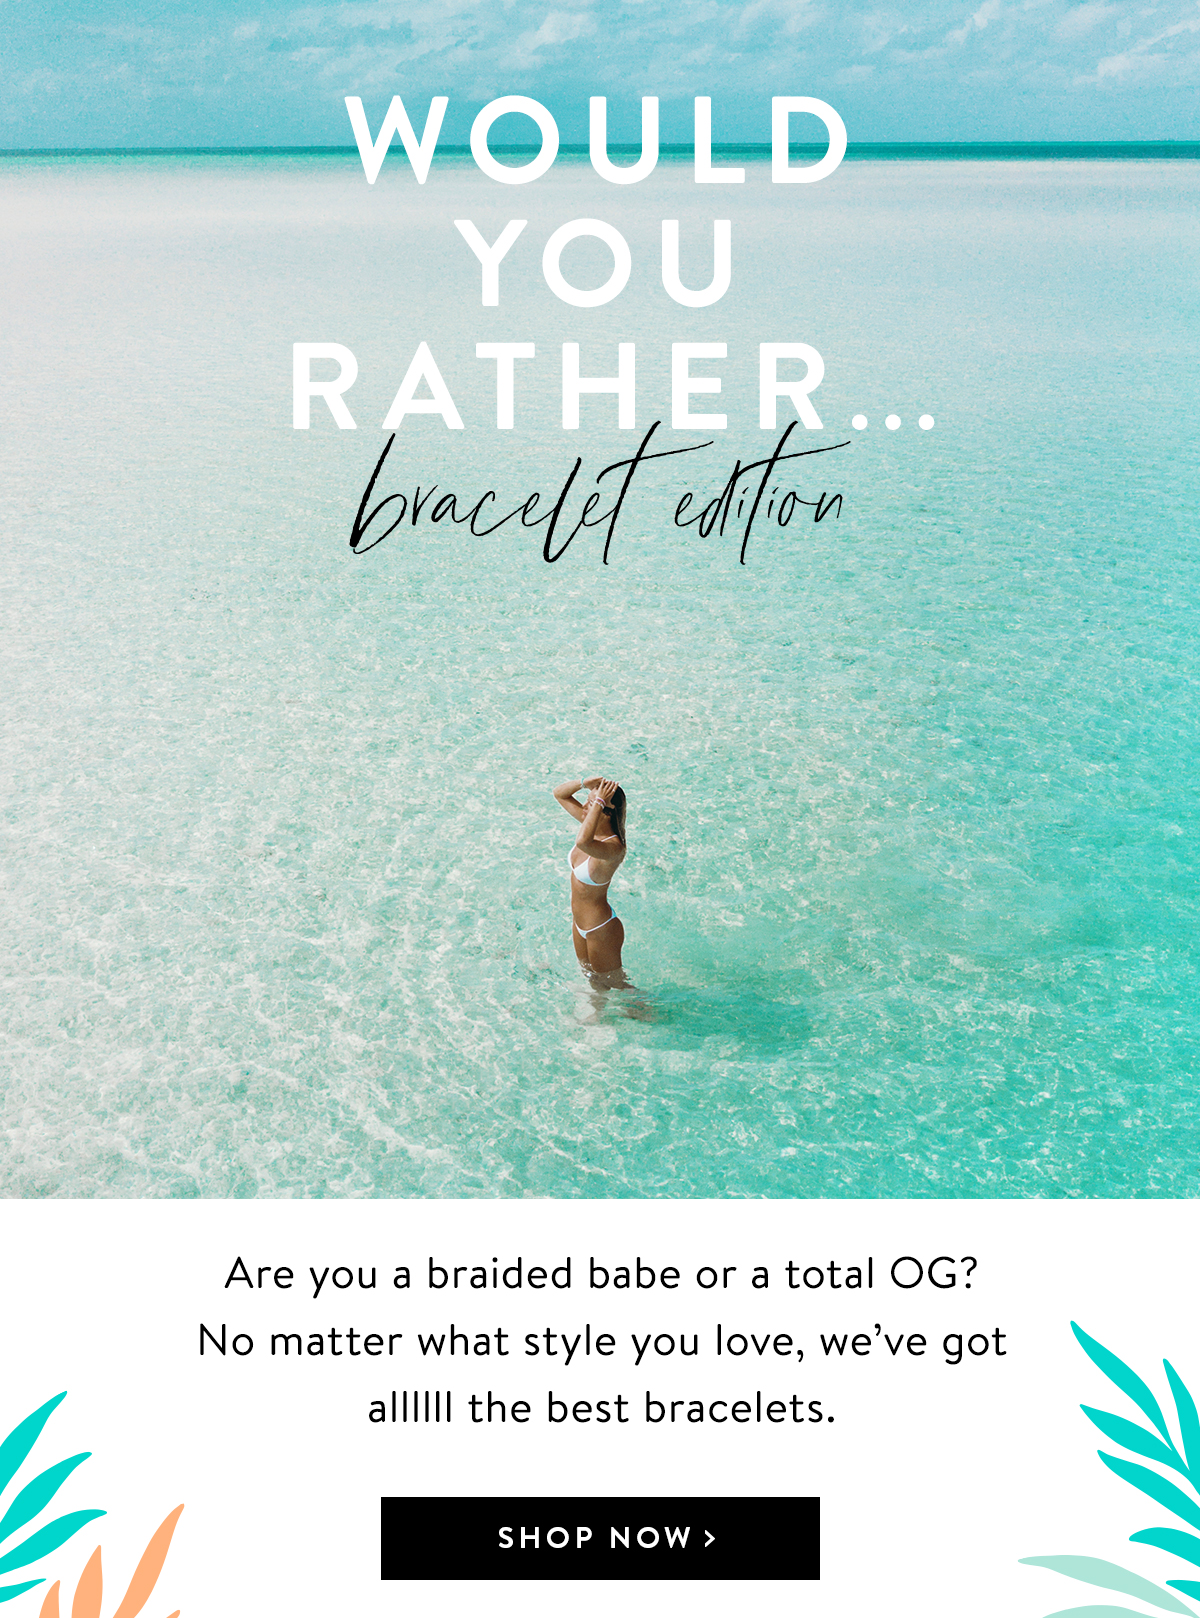 Would You Rather ... Bracelet Edition | SHOP NOW >